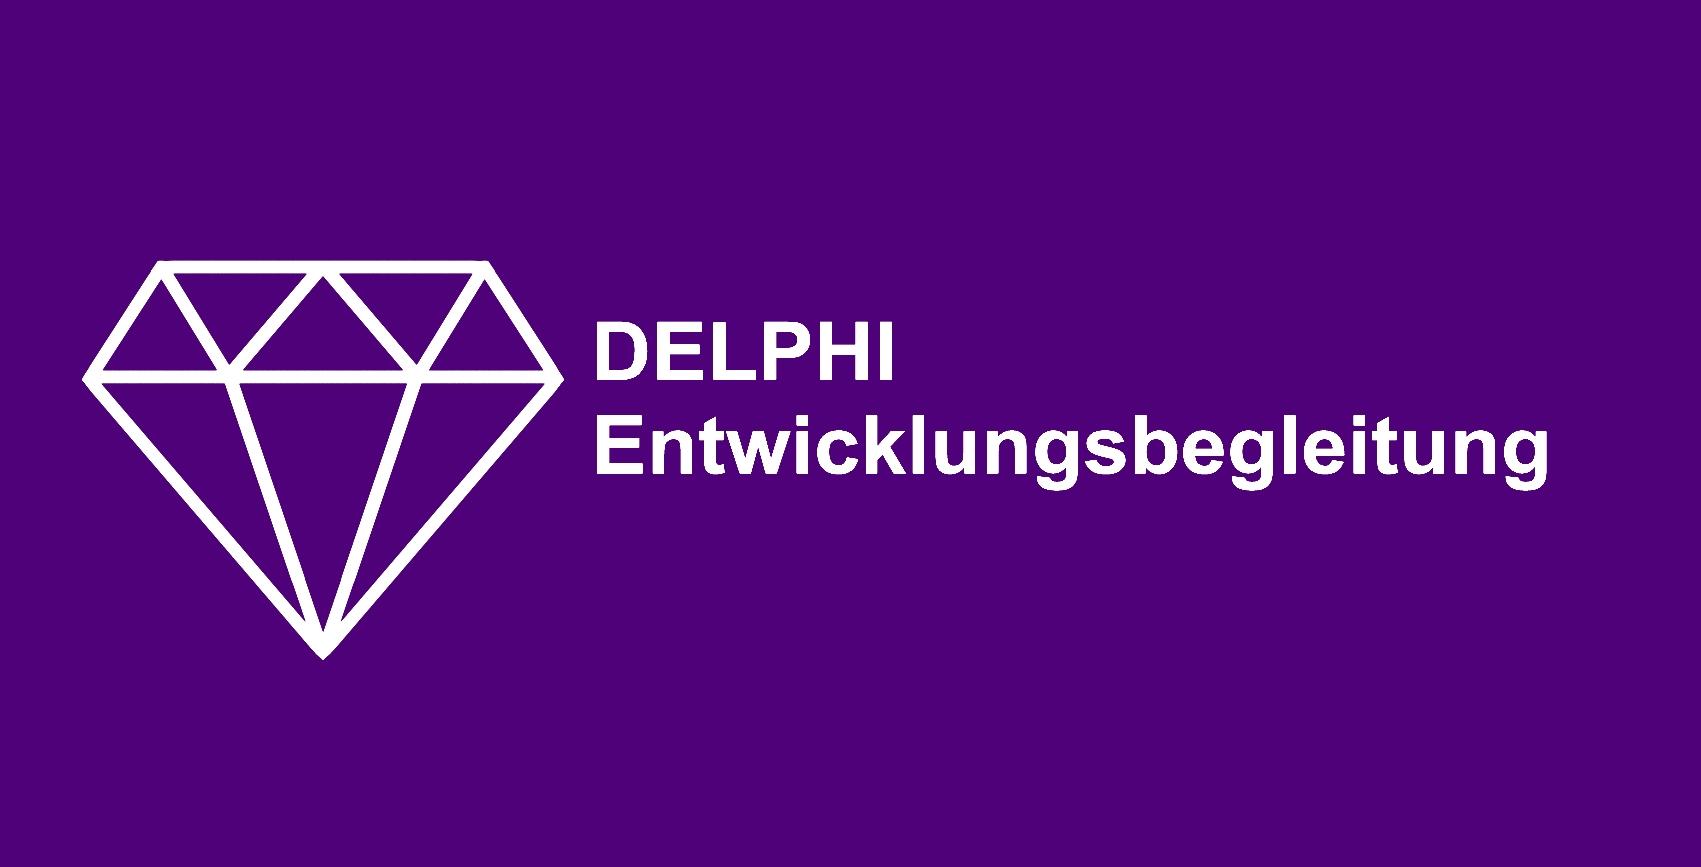 Heilpraktiker Weinheim psychologische Beratung